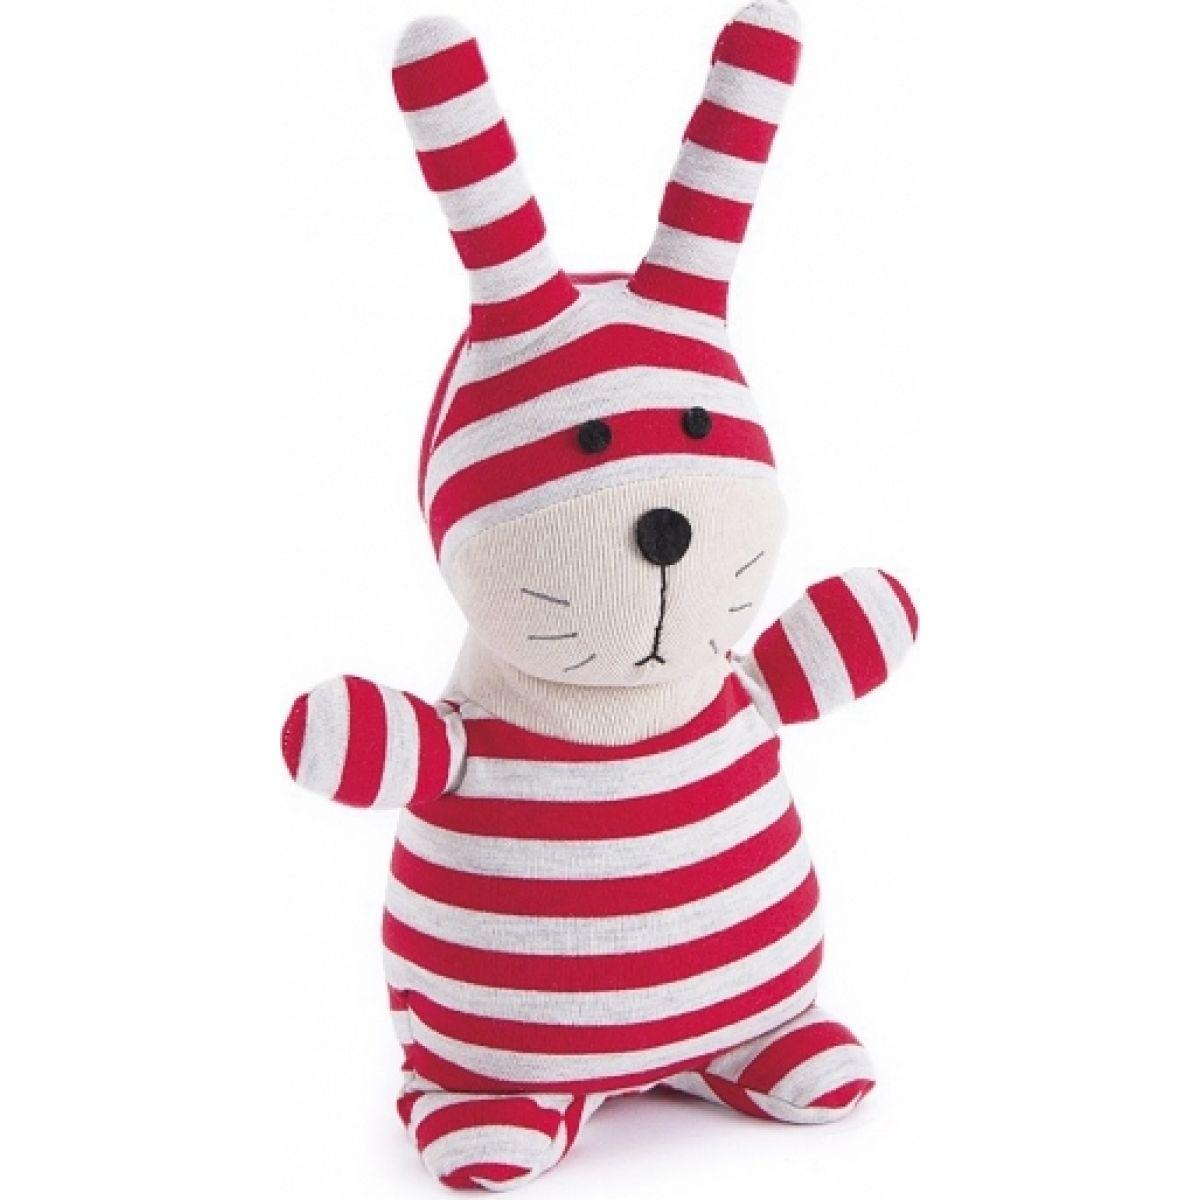 Albi Hrejivé plyšové zvieratká - Ponožkáč zajac